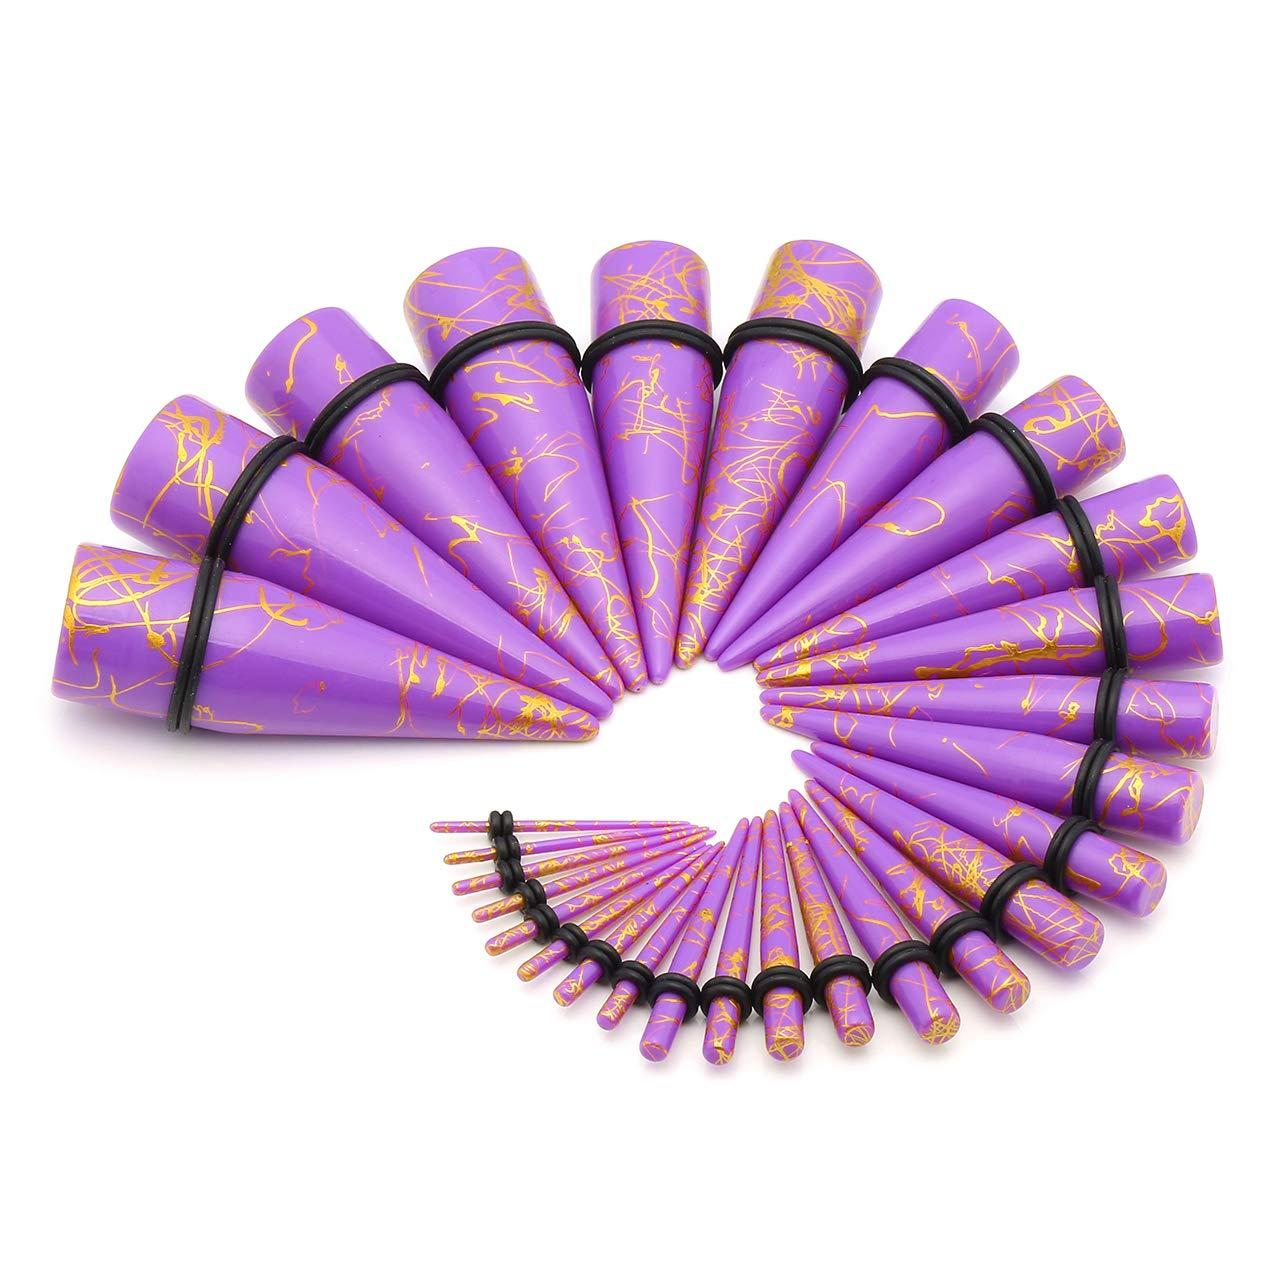 Amazon.com: Bopreina - Juego de 28 dilatadores de oreja ...